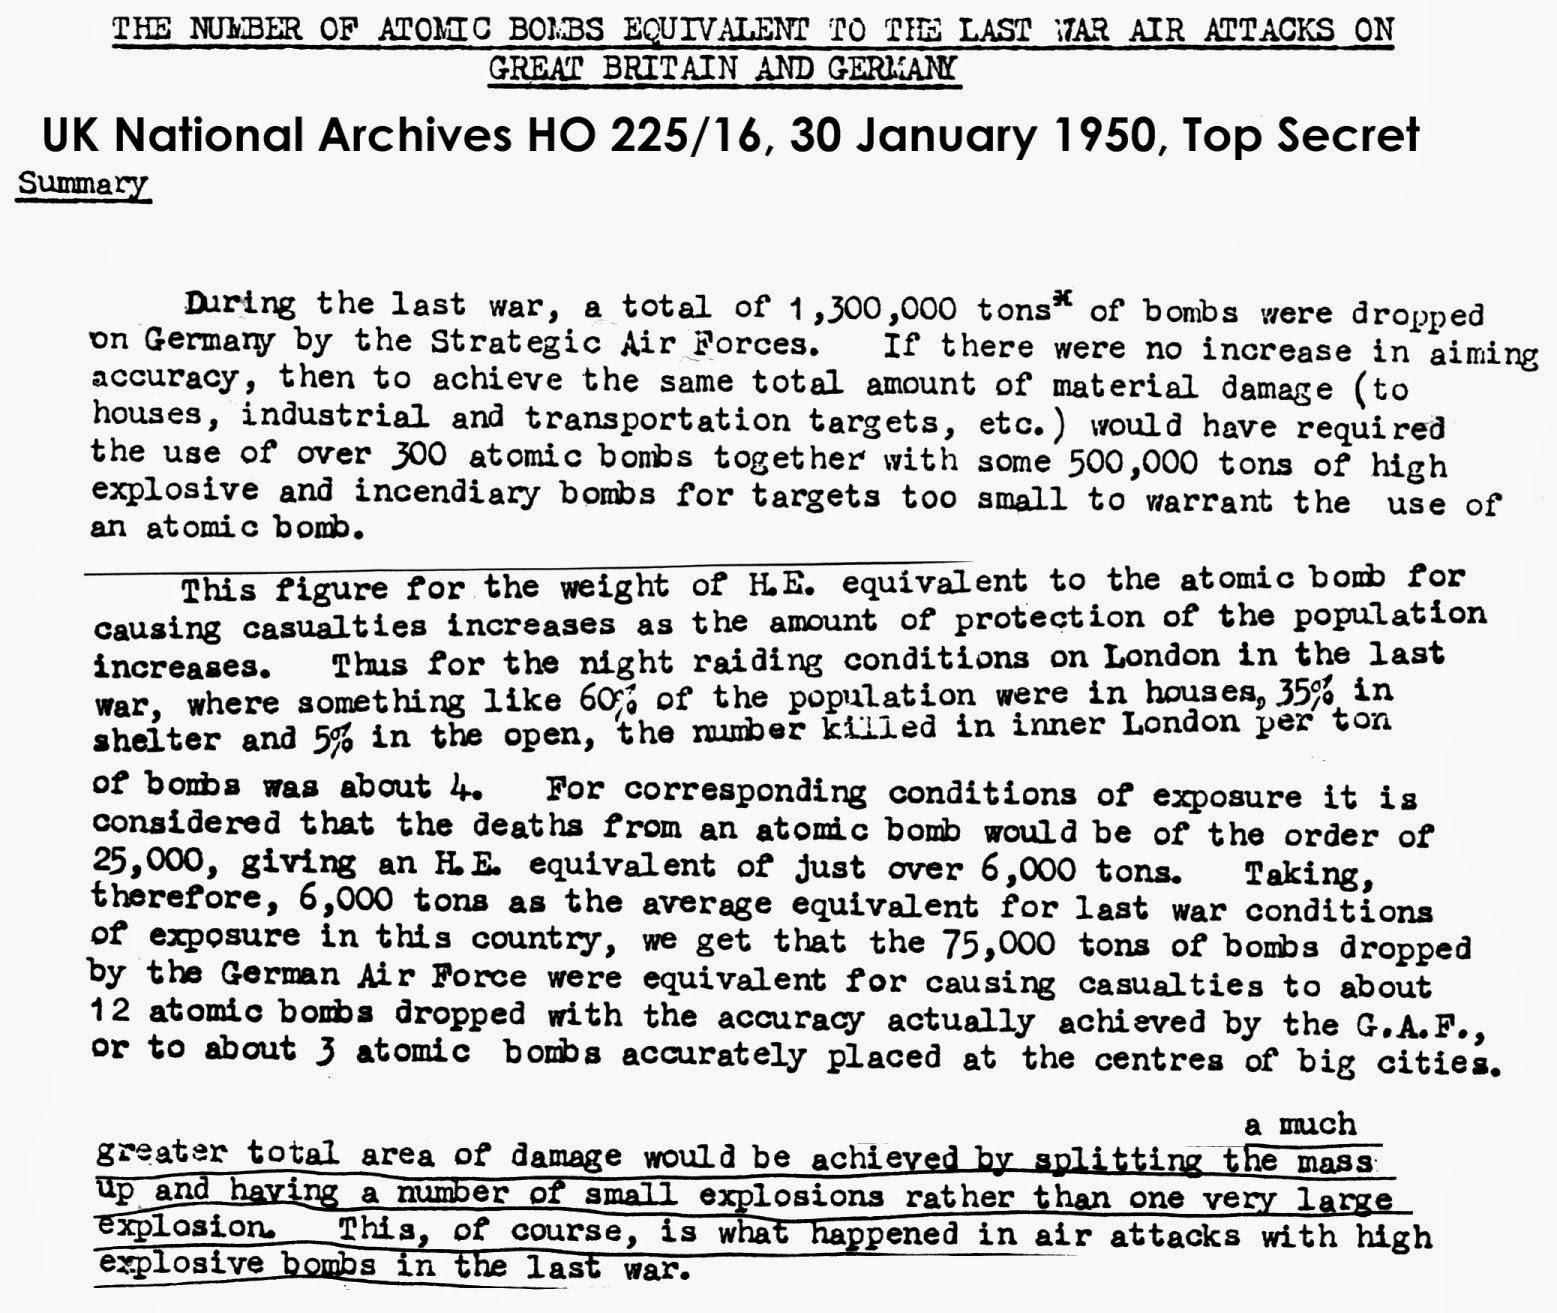 013 Numberofatomicbombs1950 Jpg Atomic Bomb Essay Shocking Topics Questions Prompts Full